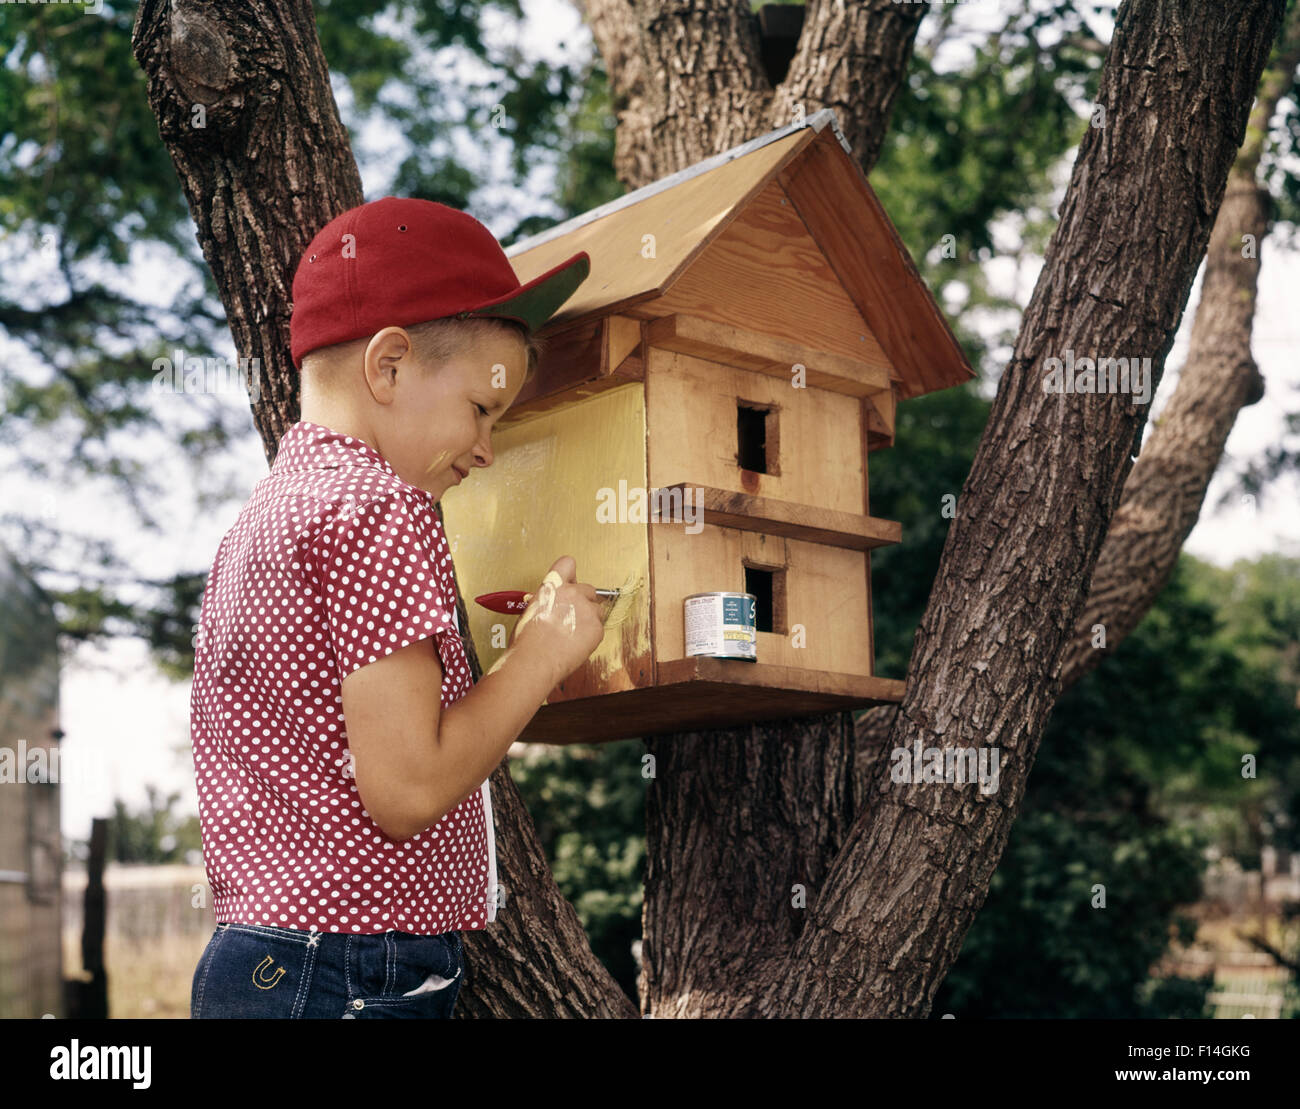 Marvelous 1970S 1980S Boy Painting Bird House Wearing Red Baseball Cap Download Free Architecture Designs Scobabritishbridgeorg